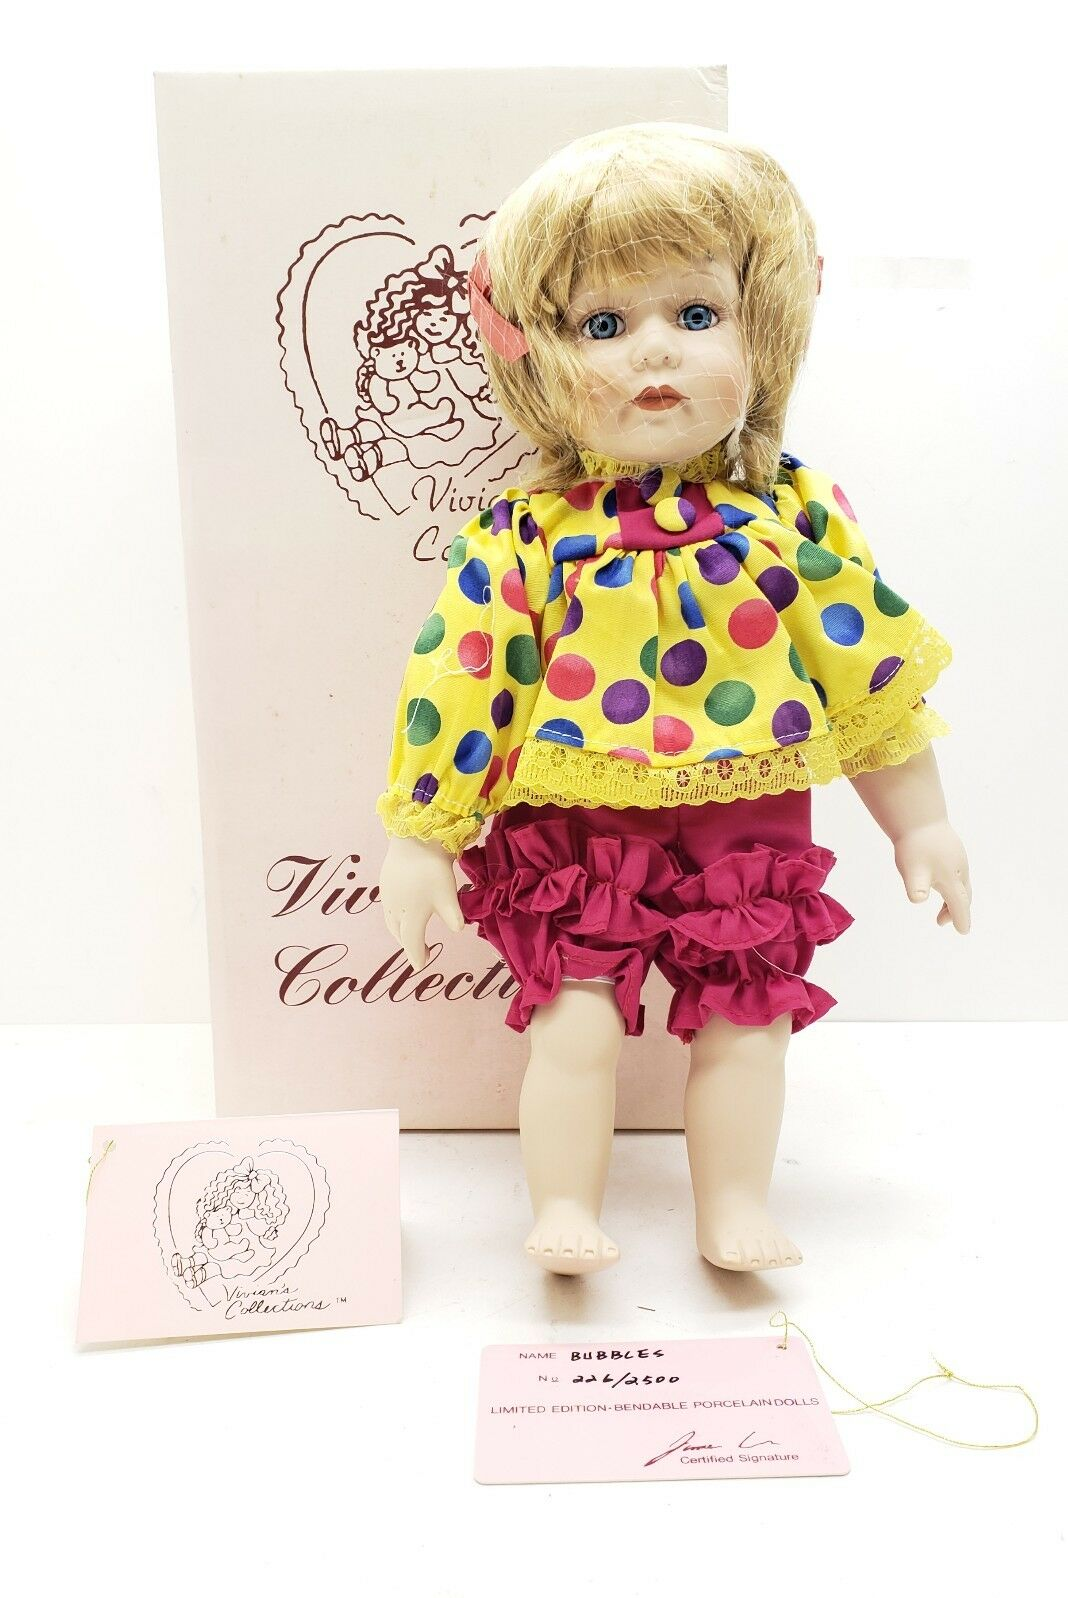 Vivian's Collections Limited Edition Bendable Porcelain Doll  Bubbles  Rare